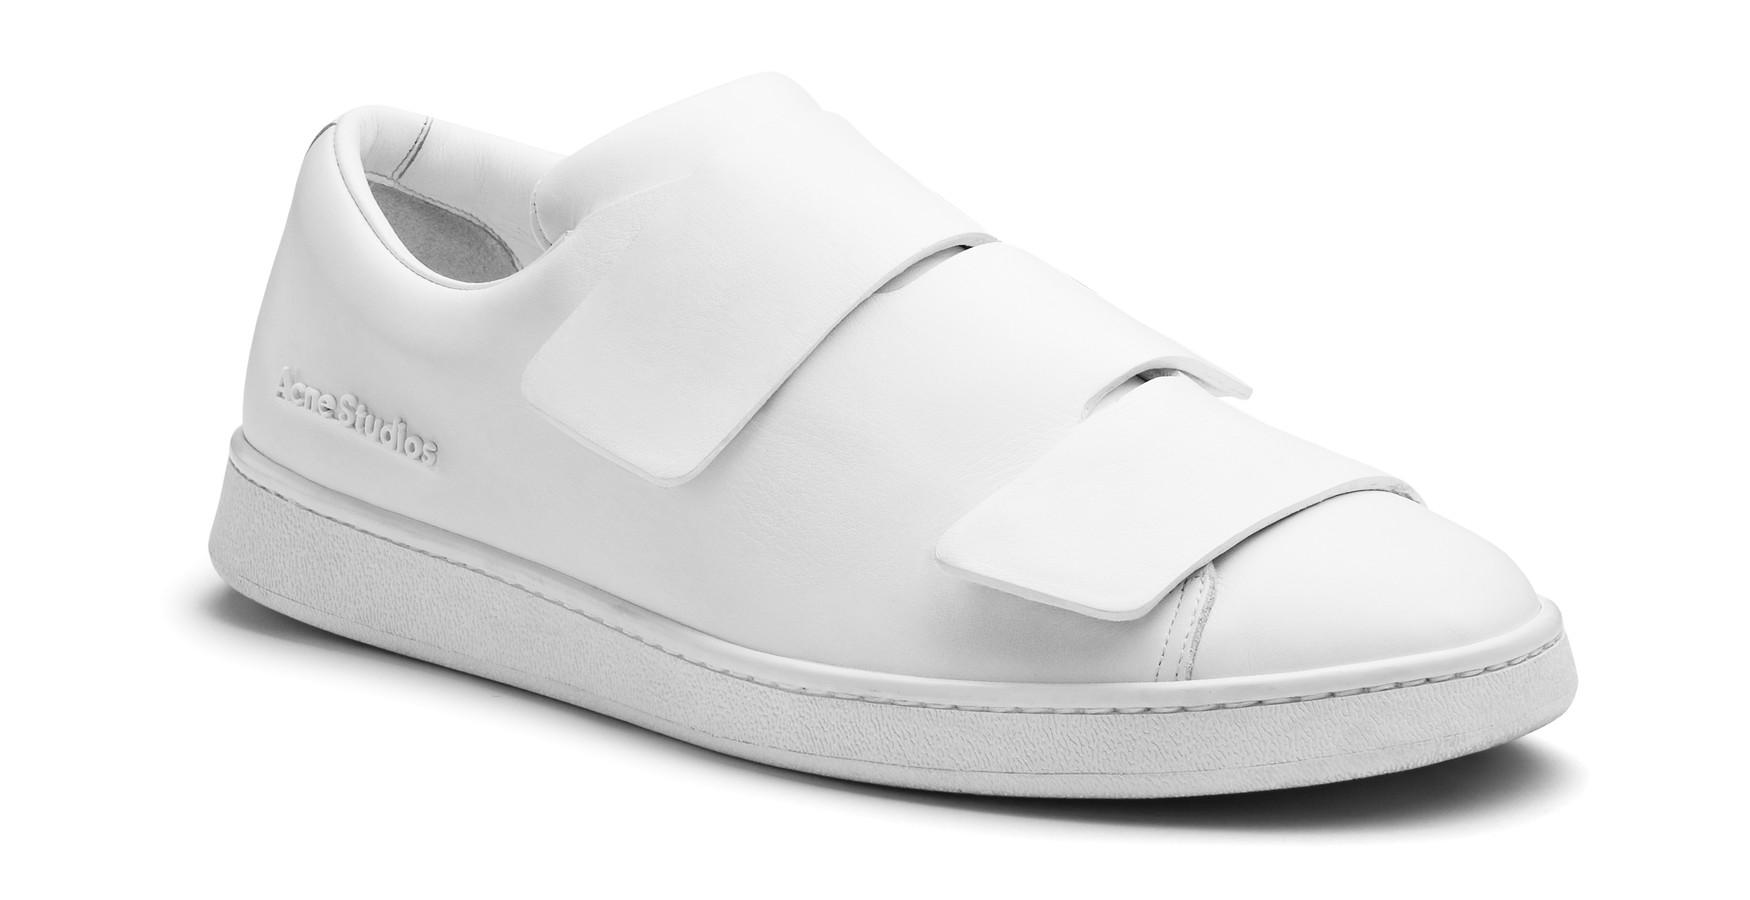 online store 291f7 c0427 Acne Studios - Triple lo white - Shoes - SHOP MAN - Shop Shop Ready to  Wear, Accessories, Shoes and Denim for Men and Women